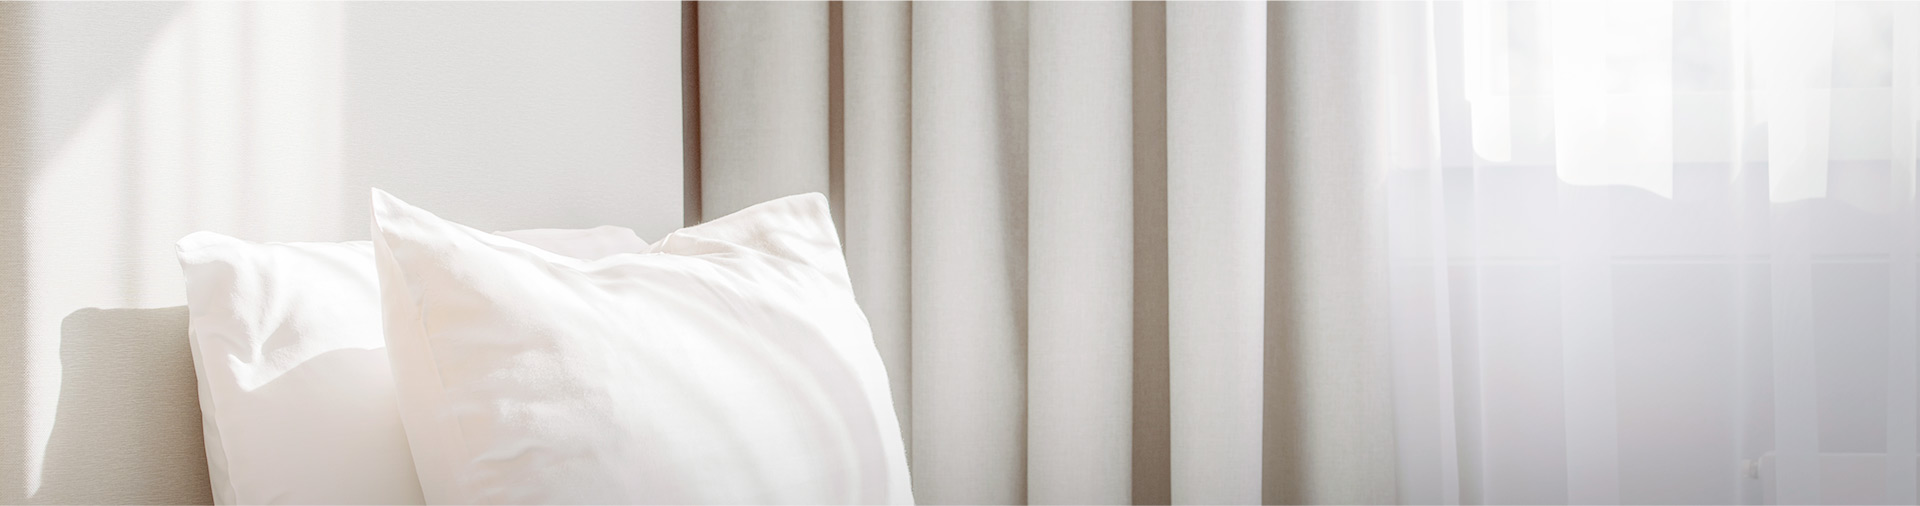 bernachtungenrastst tte luzern. Black Bedroom Furniture Sets. Home Design Ideas